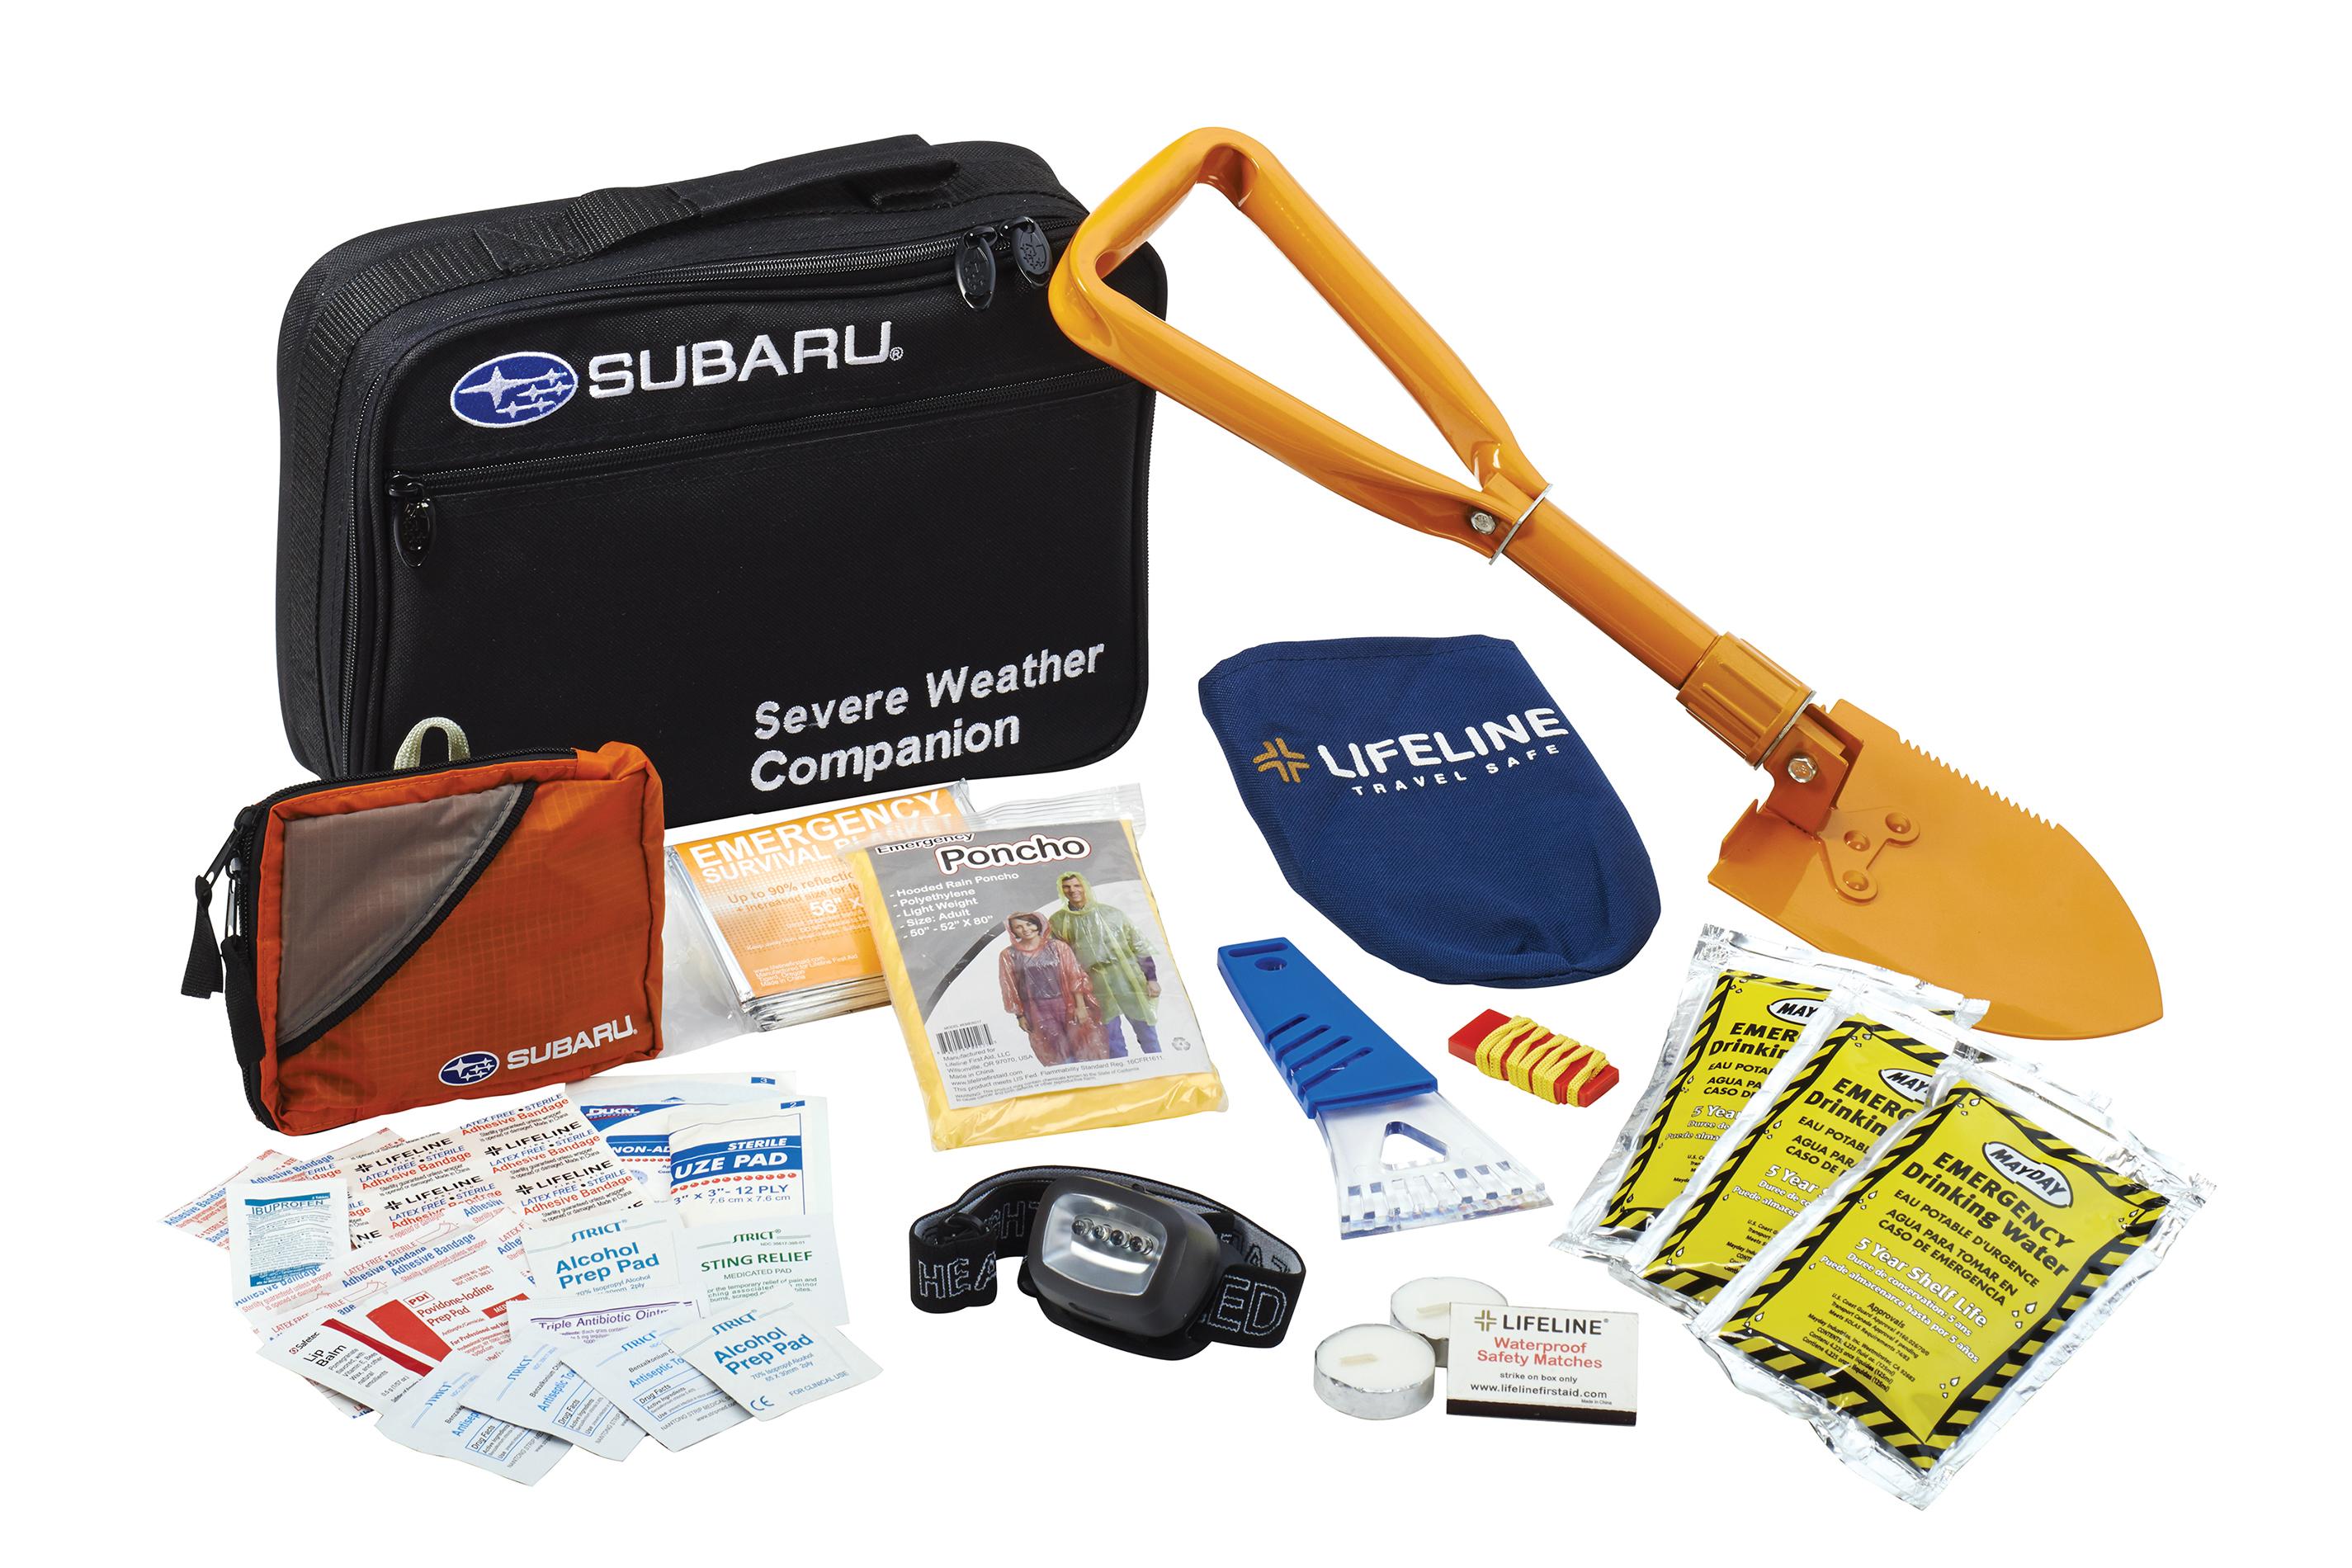 Subaru Crosstrek Genuine Subaru Severe Weather Companion